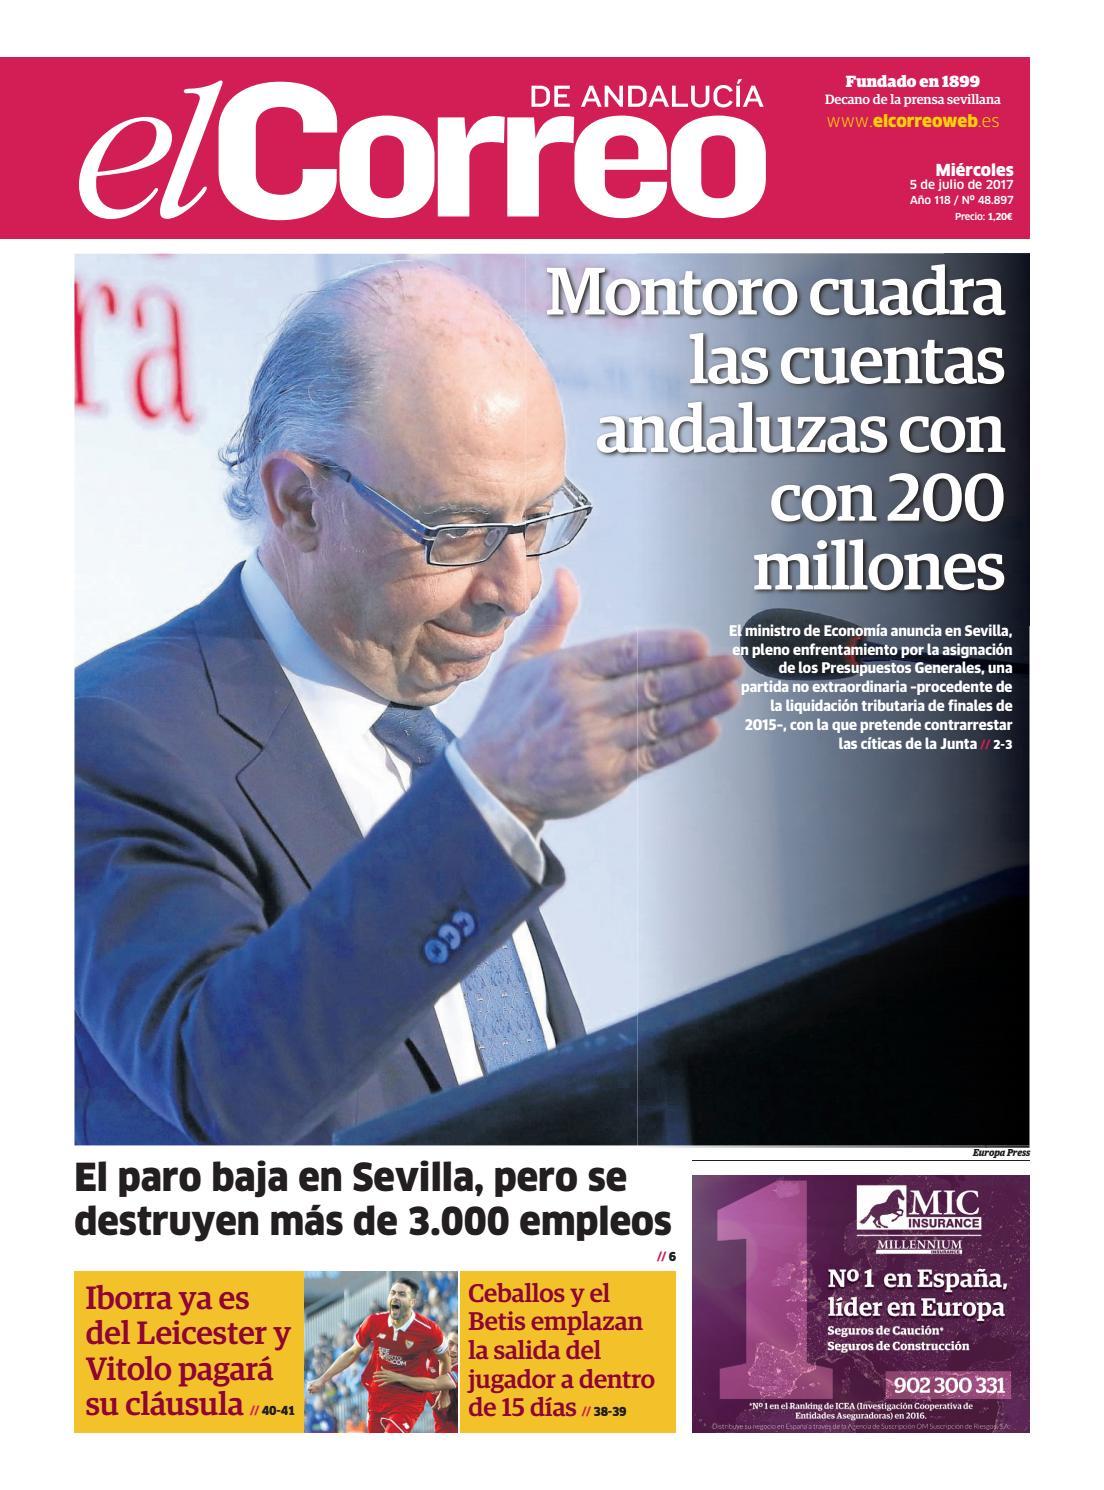 Ruleta americana pleno comprar loteria euromillones en La Serena - 8277